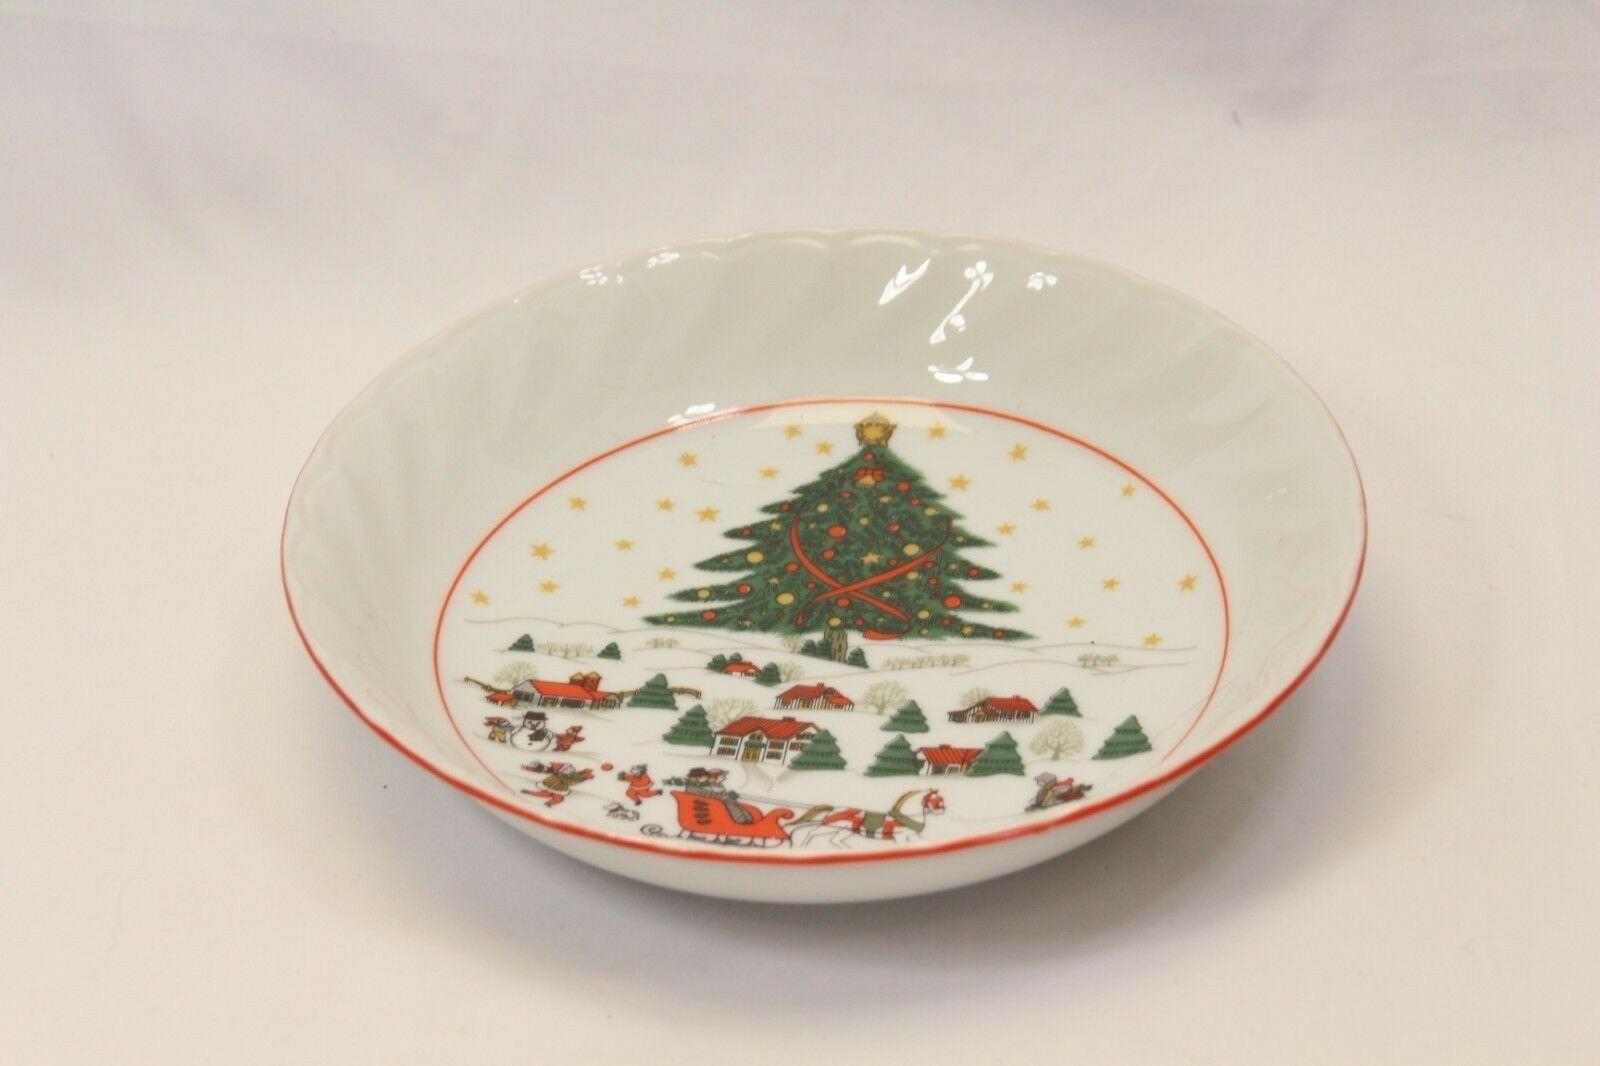 Kopin Xmas Pleasure Dinner Plates Scalloped Rim Lot of 16 image 7